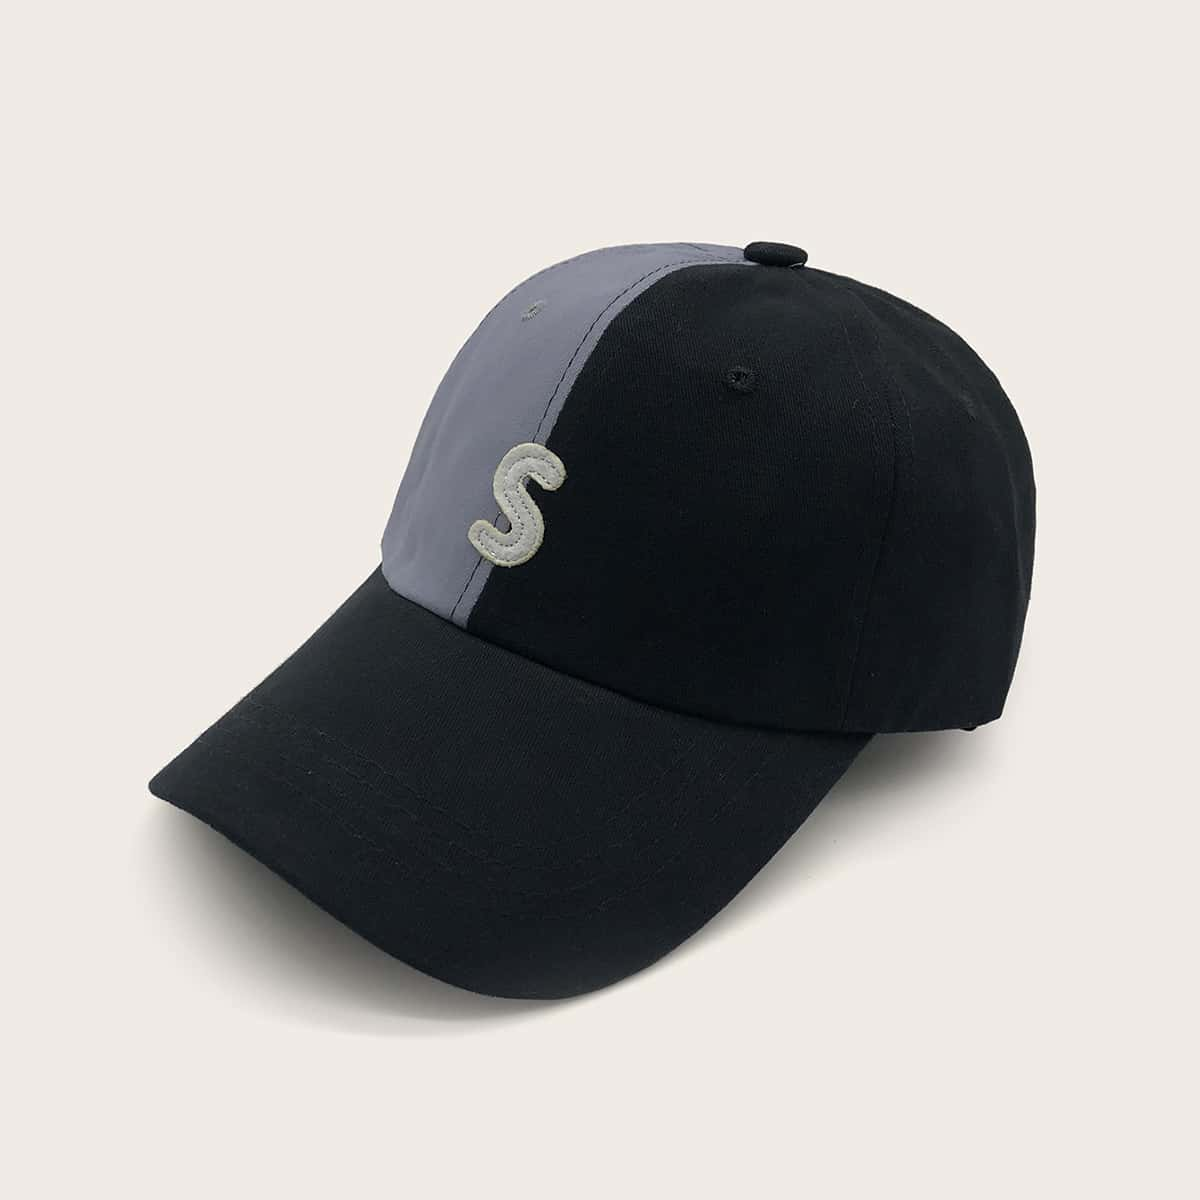 Heren baseball cap met kleurenblok